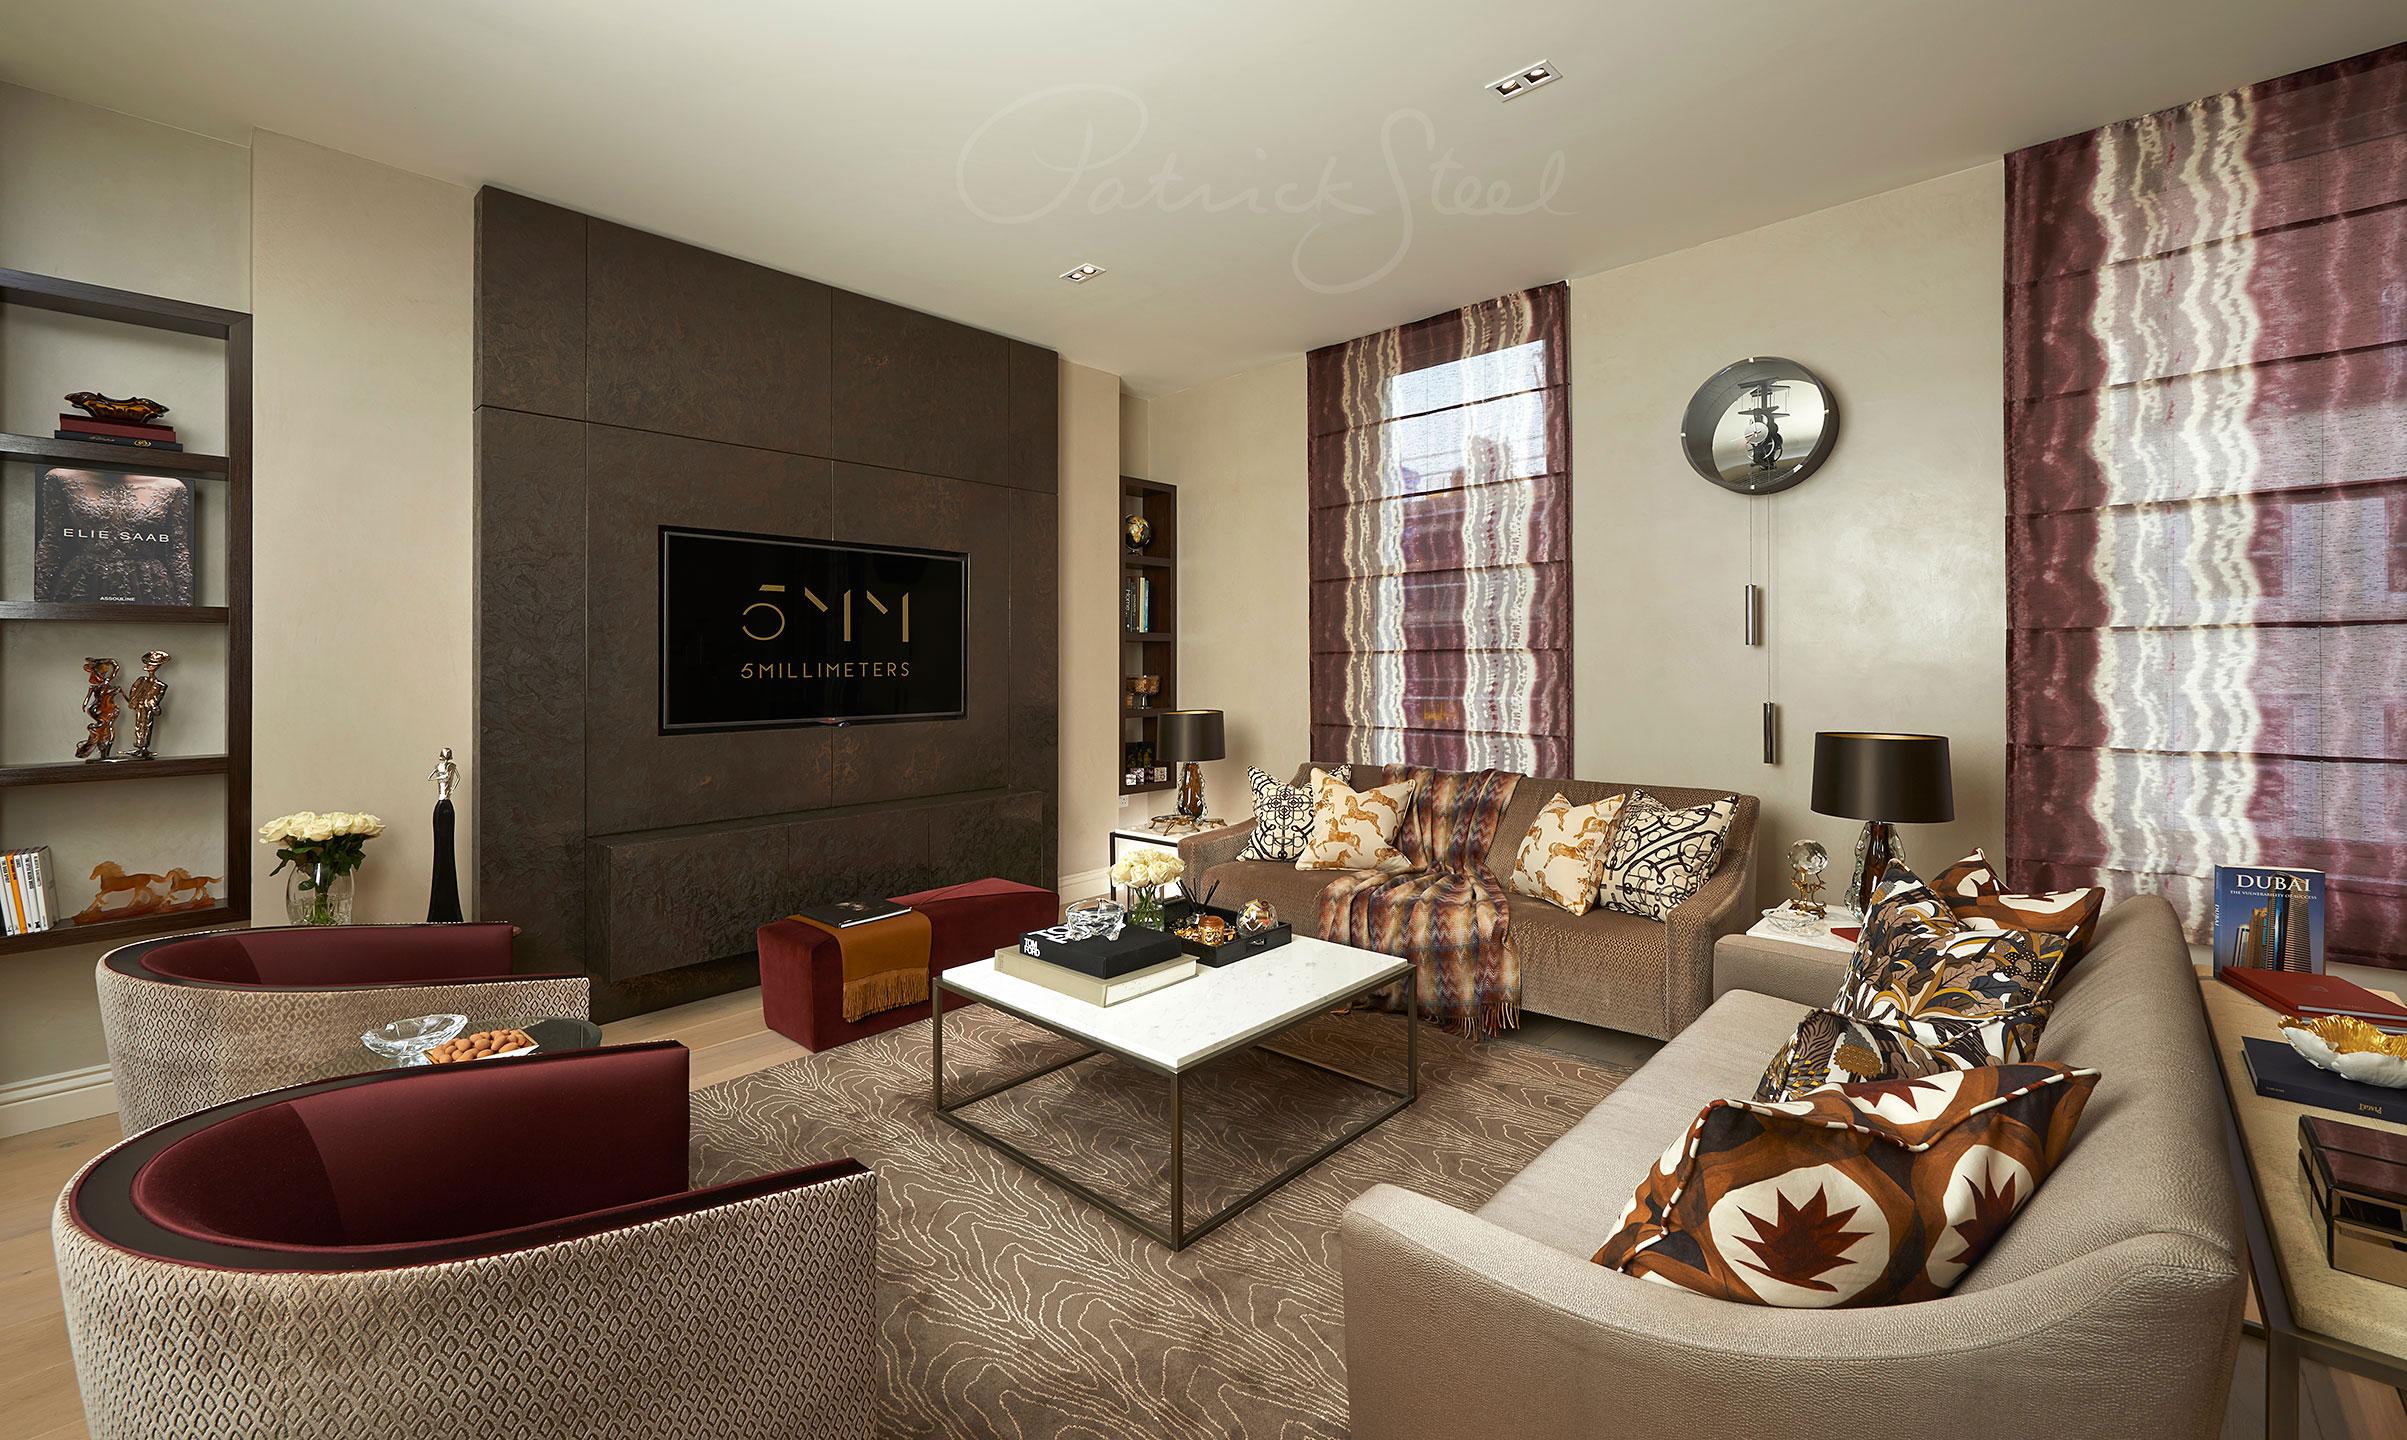 Seymour Street | London | Interior Design by 5mm